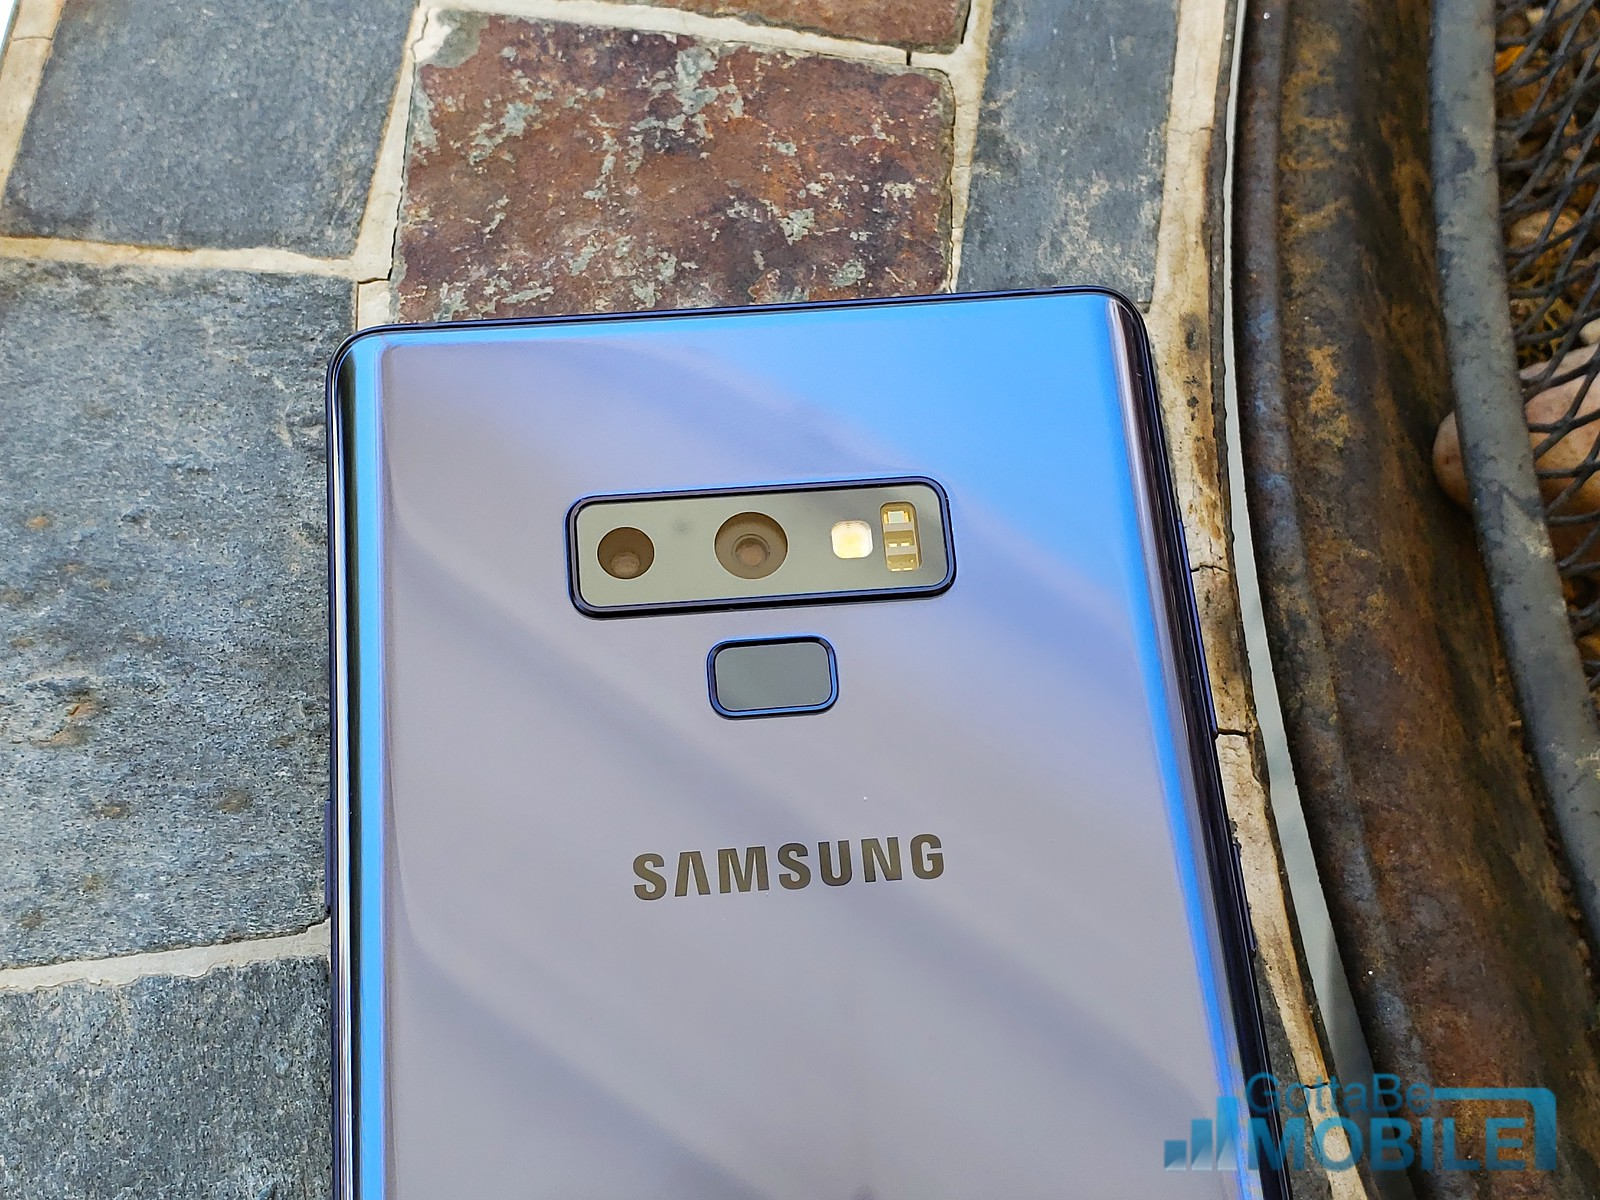 Samsung Galaxy S20+ vs Galaxy Note 9: Worth the Upgrade?